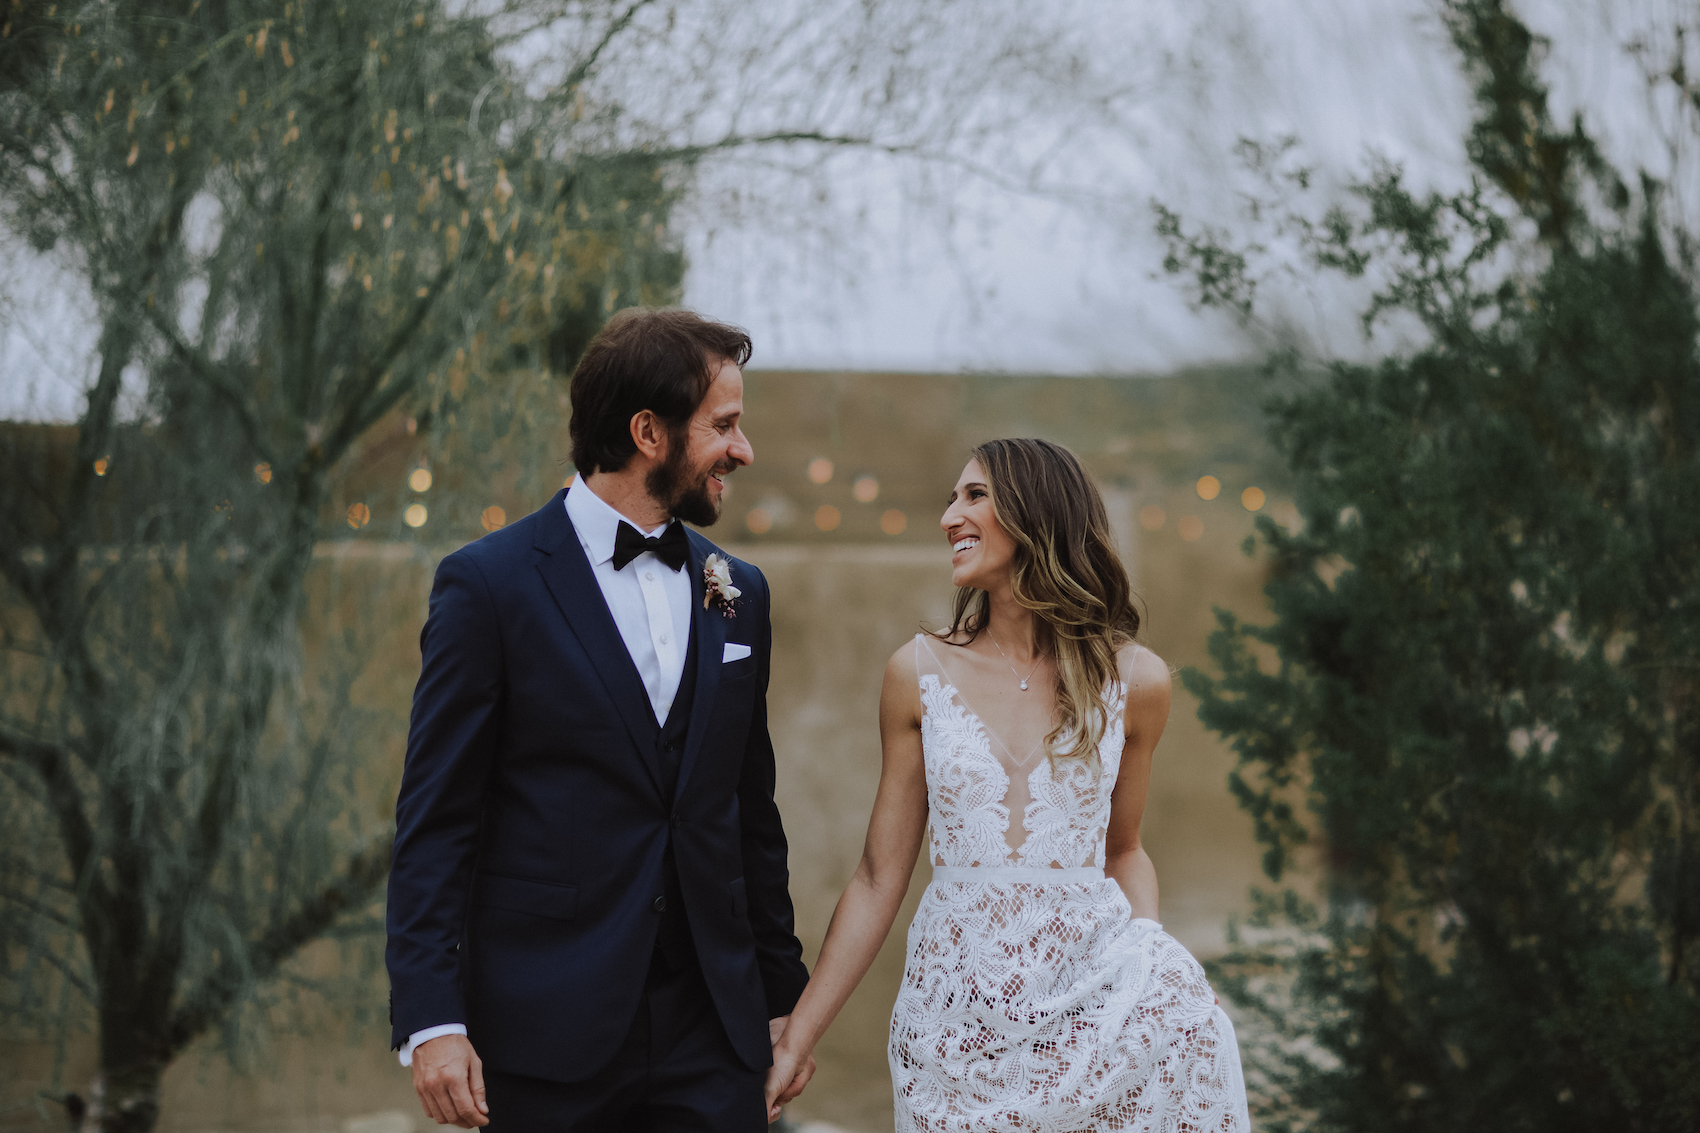 29-Palms-Inn-Joshua-Tree-Jewish-Wedding-H+M-24.jpg